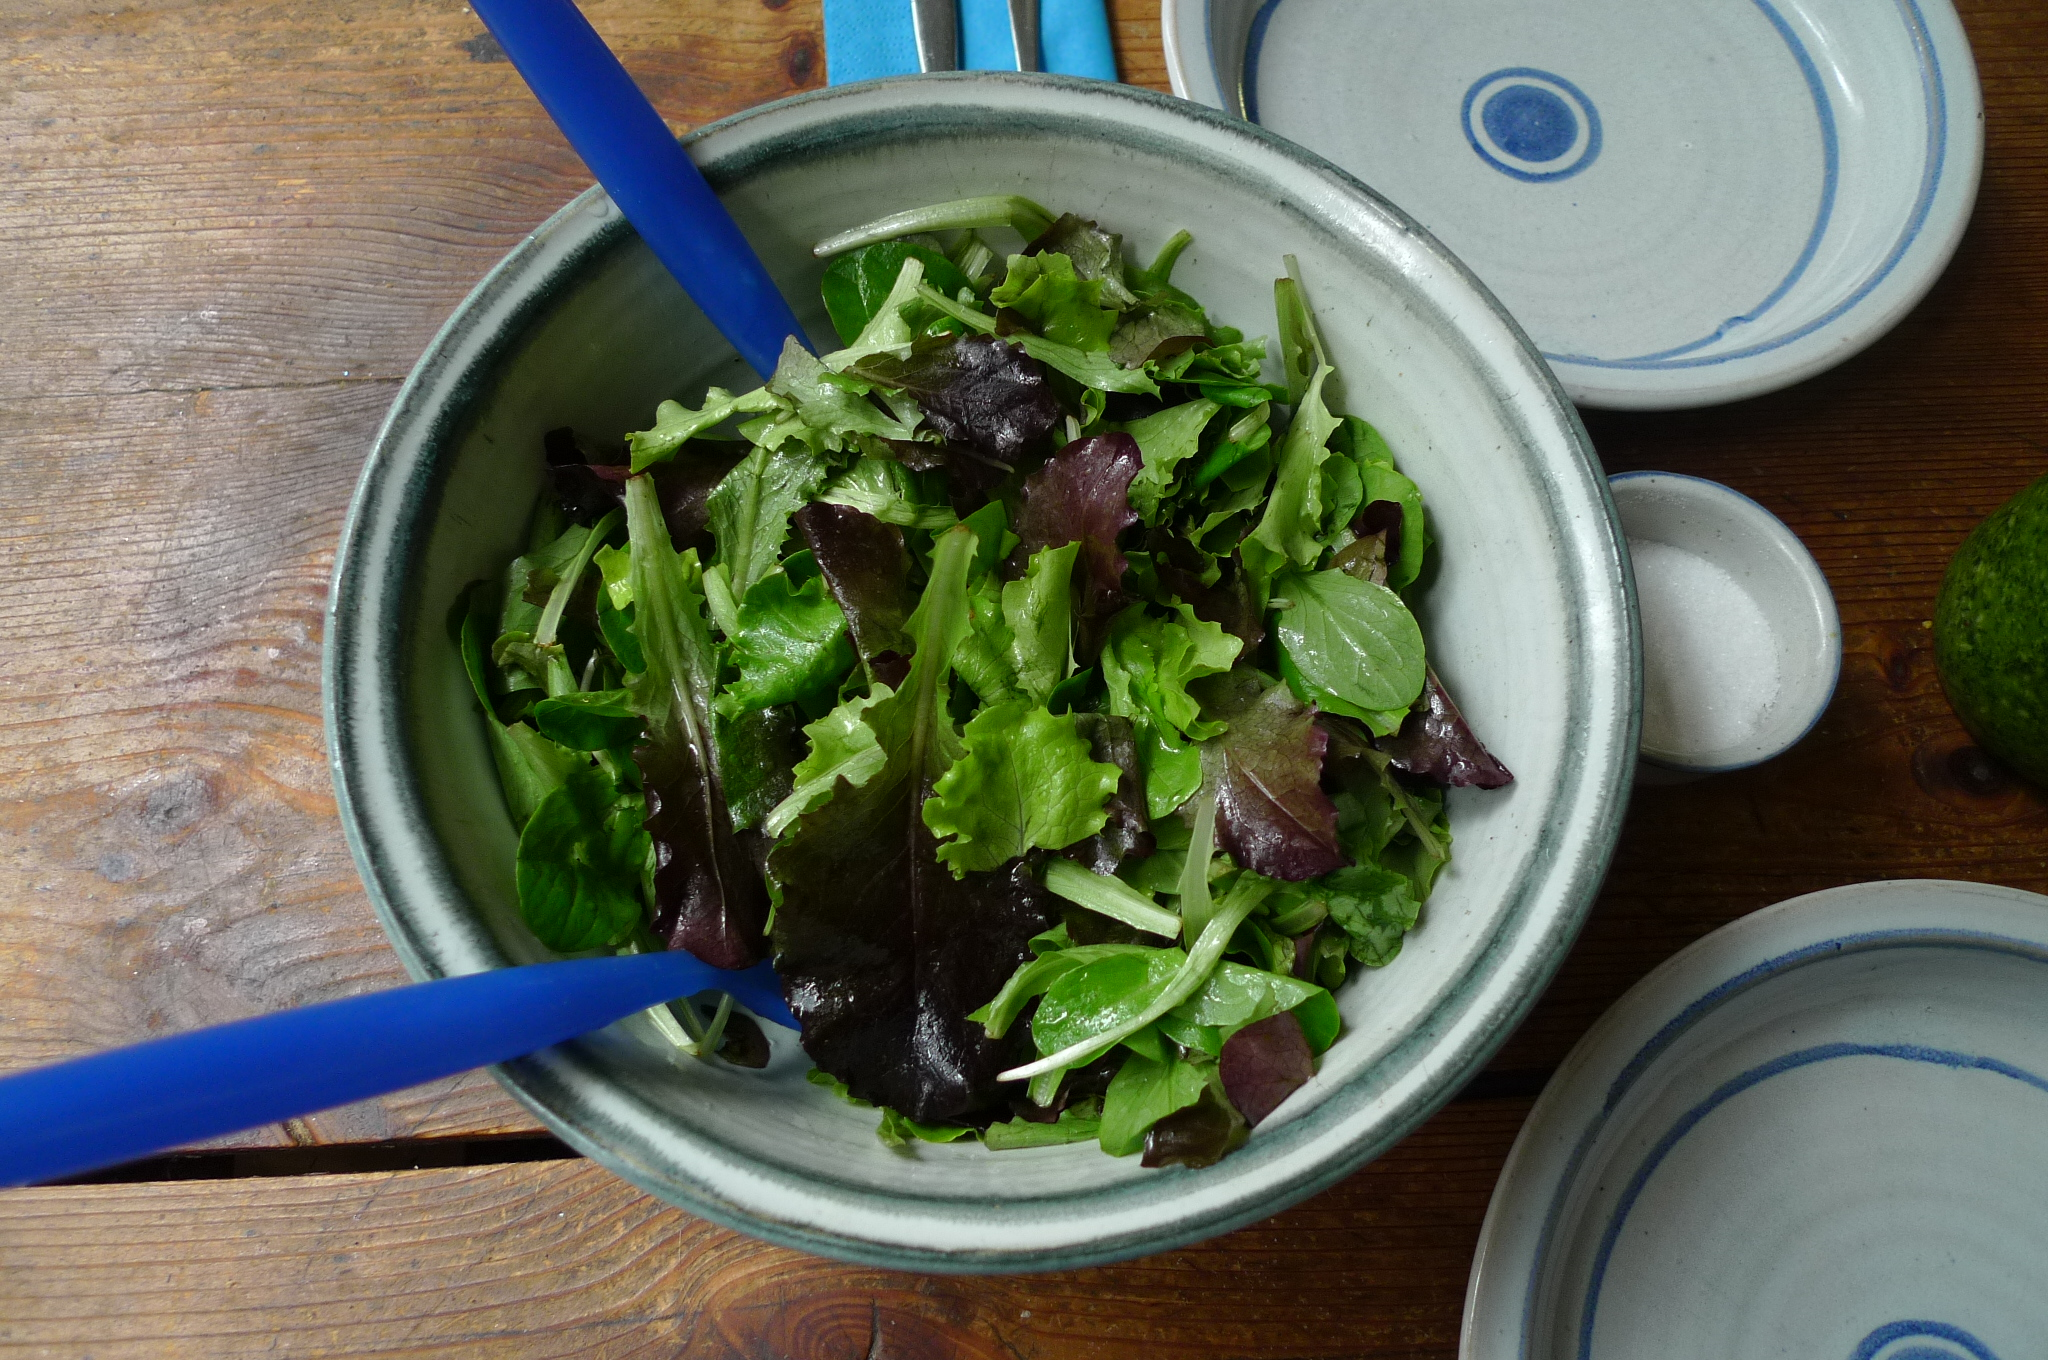 Grüne Nudeln,Ruccolapesto,Pilze,Bratpaprika,Salat-8.3.15   (6)